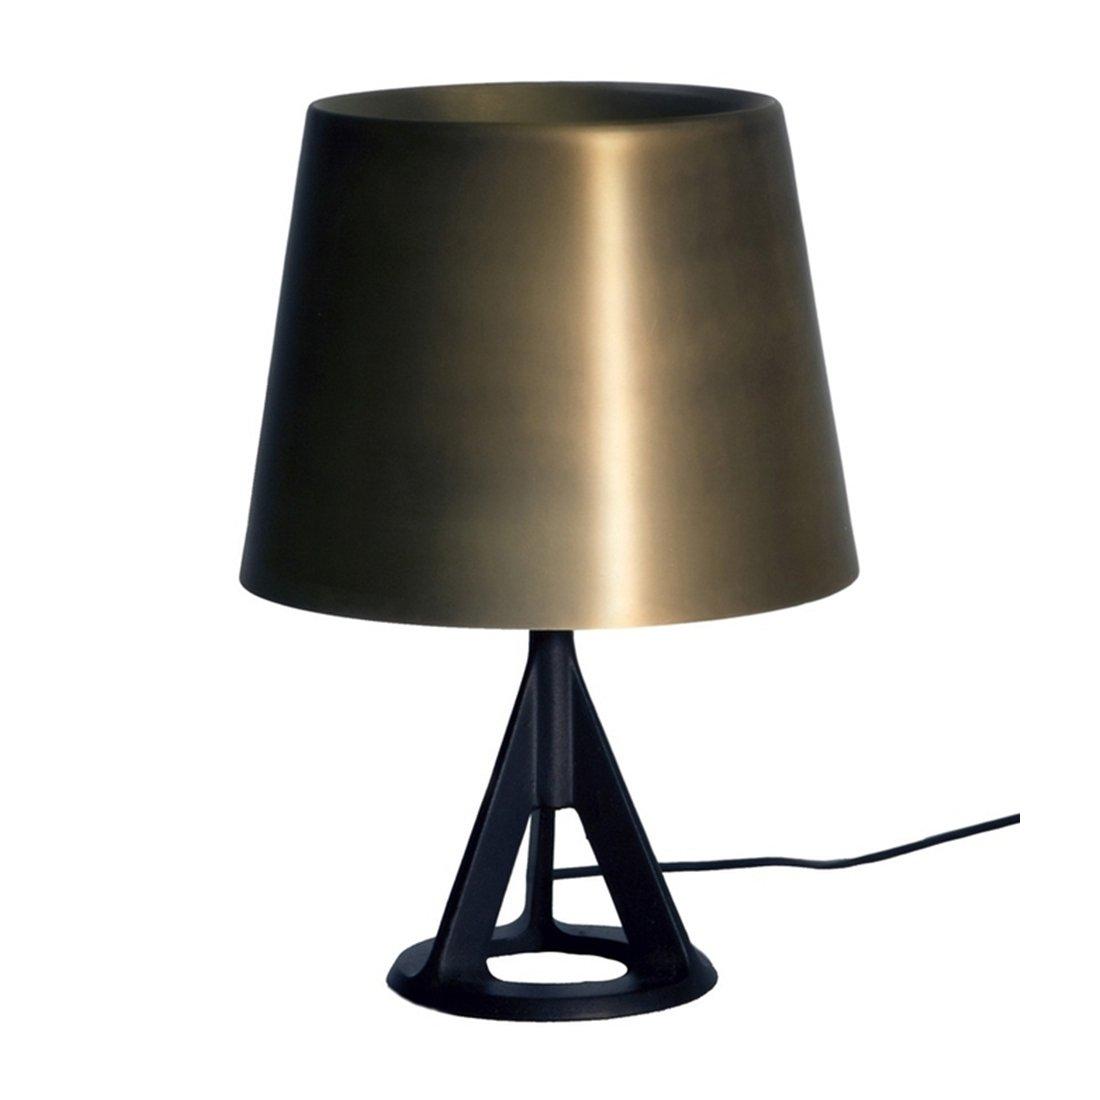 Tom Dixon Base Table Light Tafellamp Geborsteld Messing